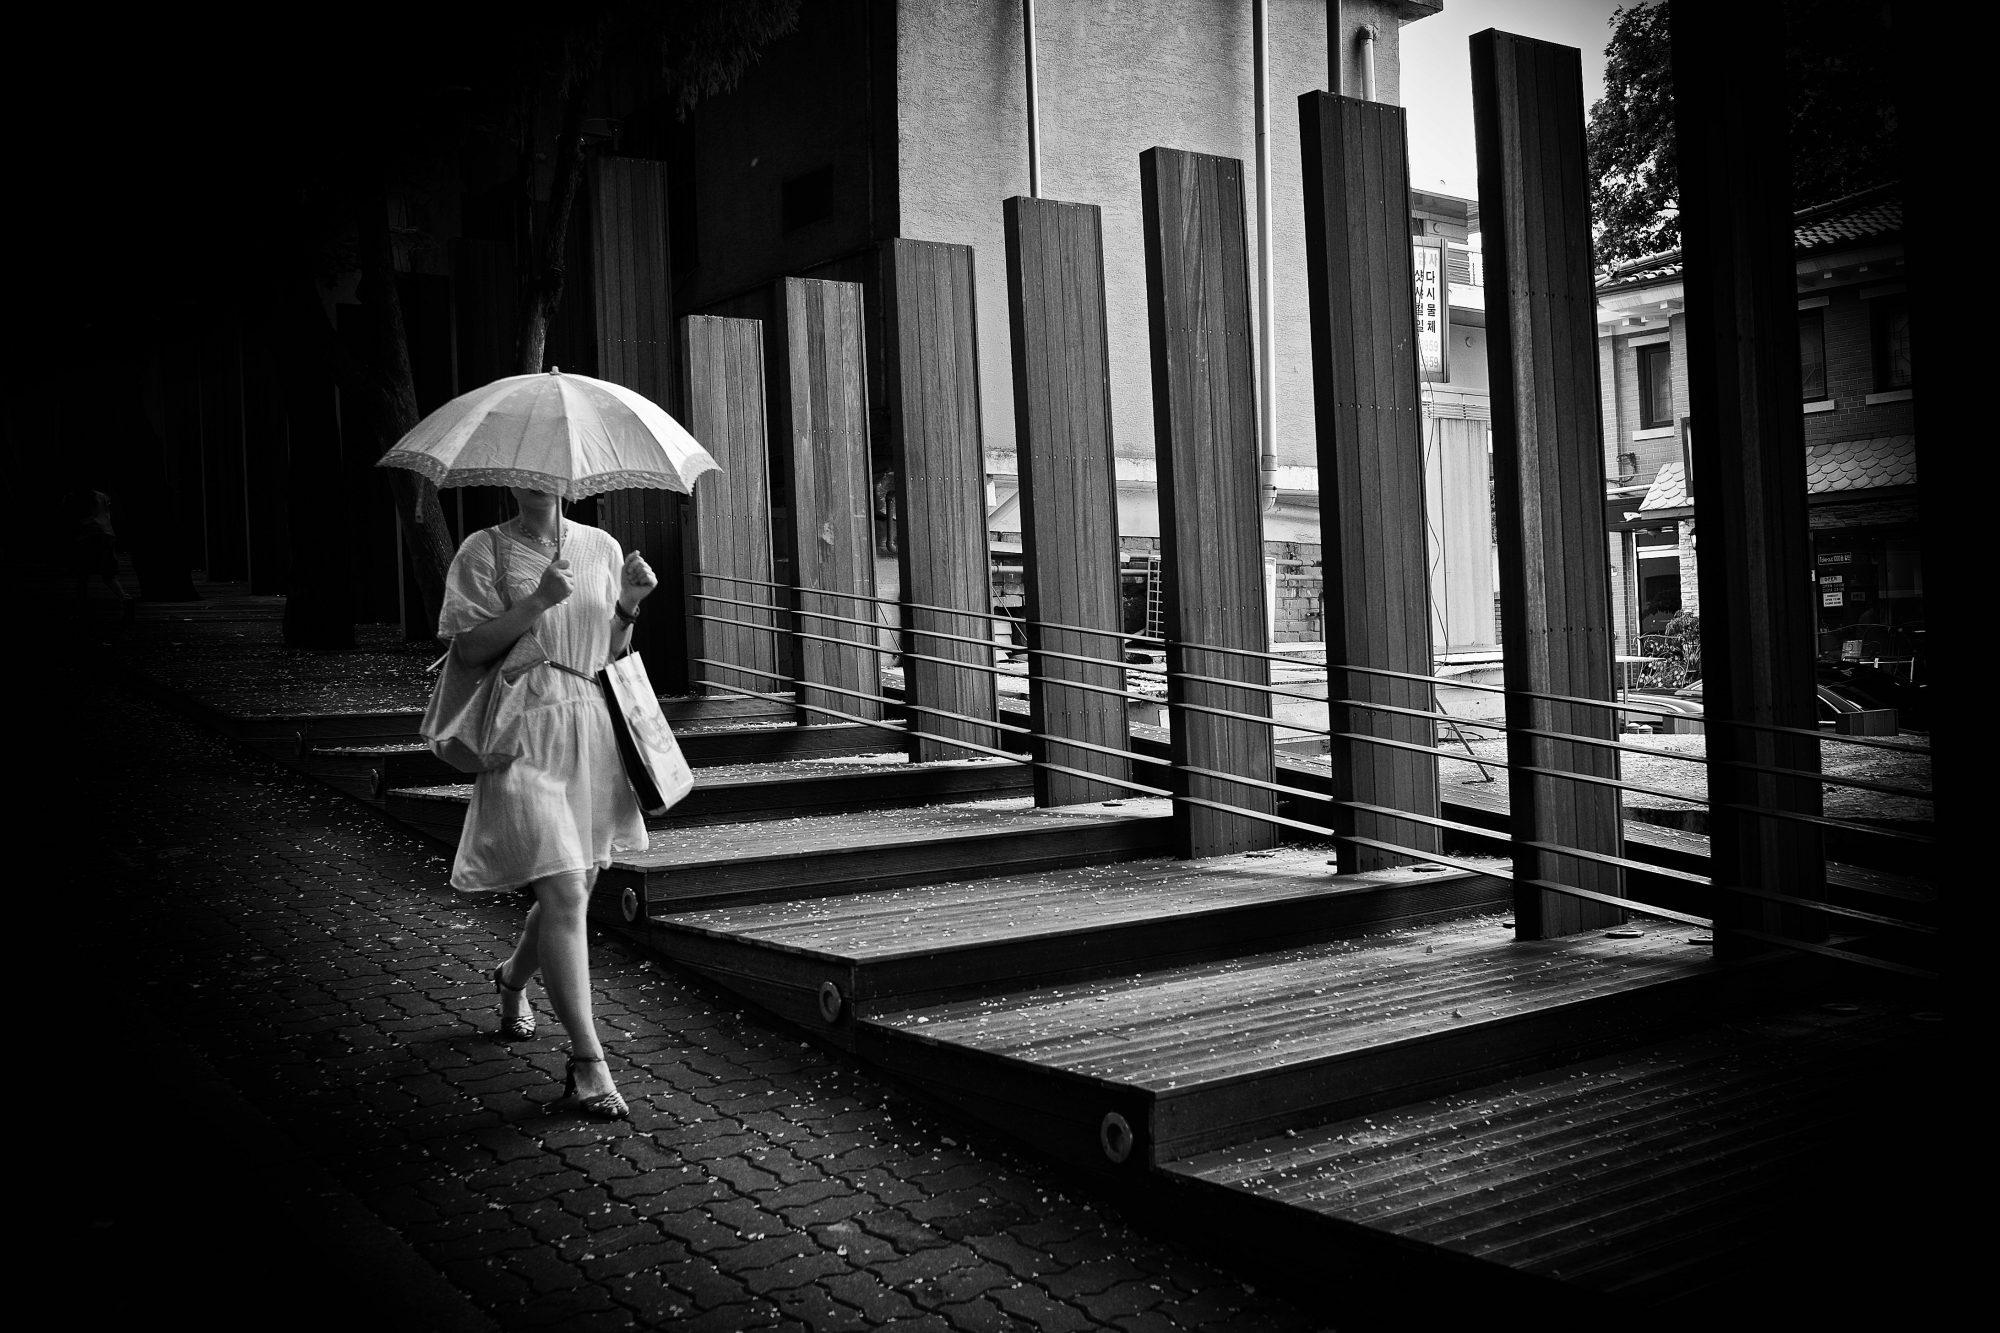 eric-kim-street-photography-beauty-in-the-mundane-1